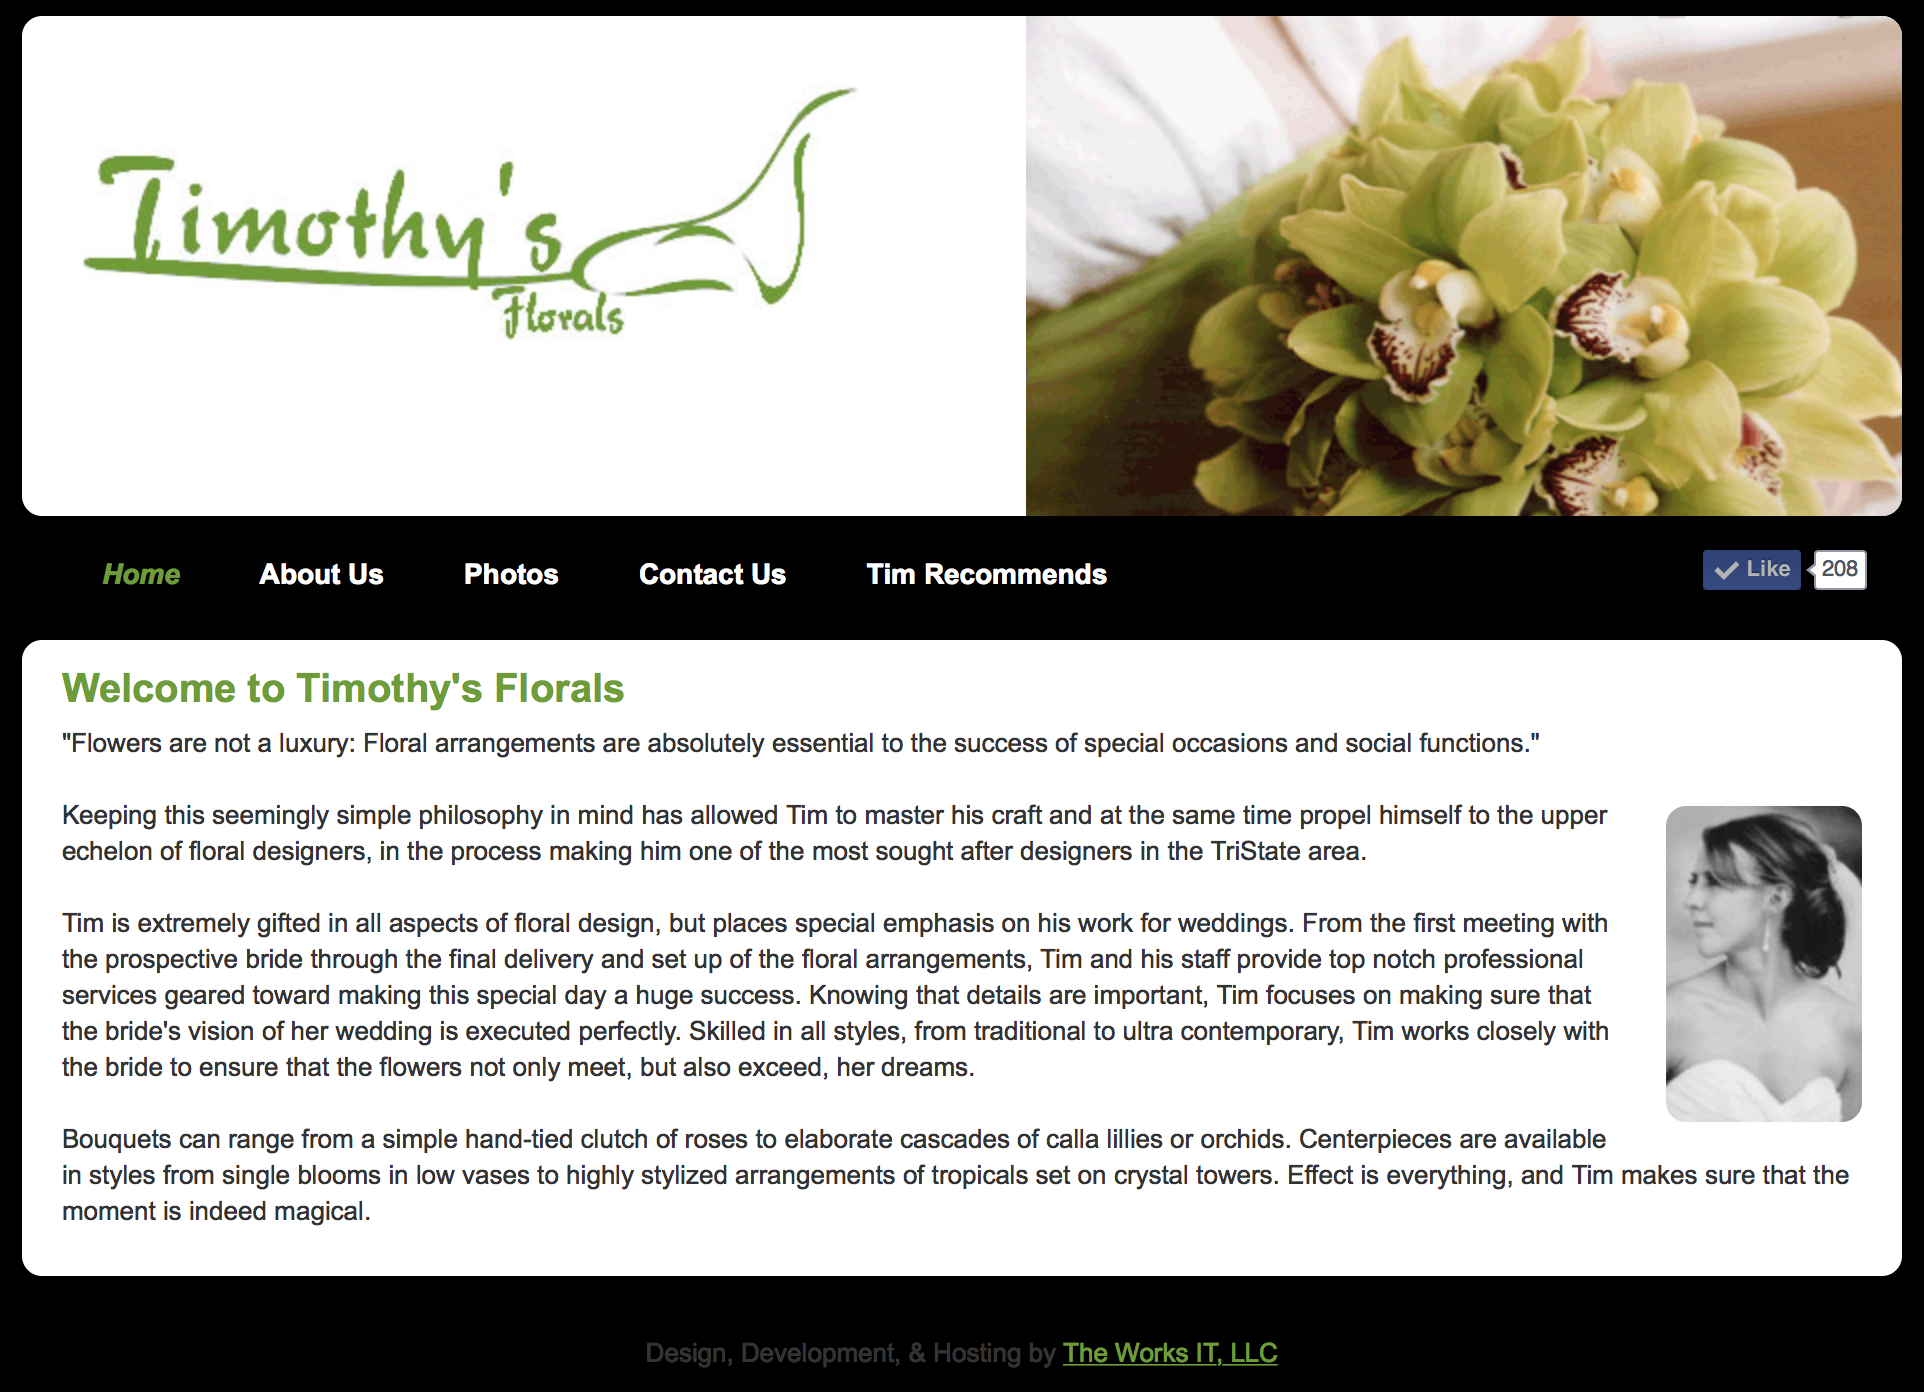 TimothysFlorals.com